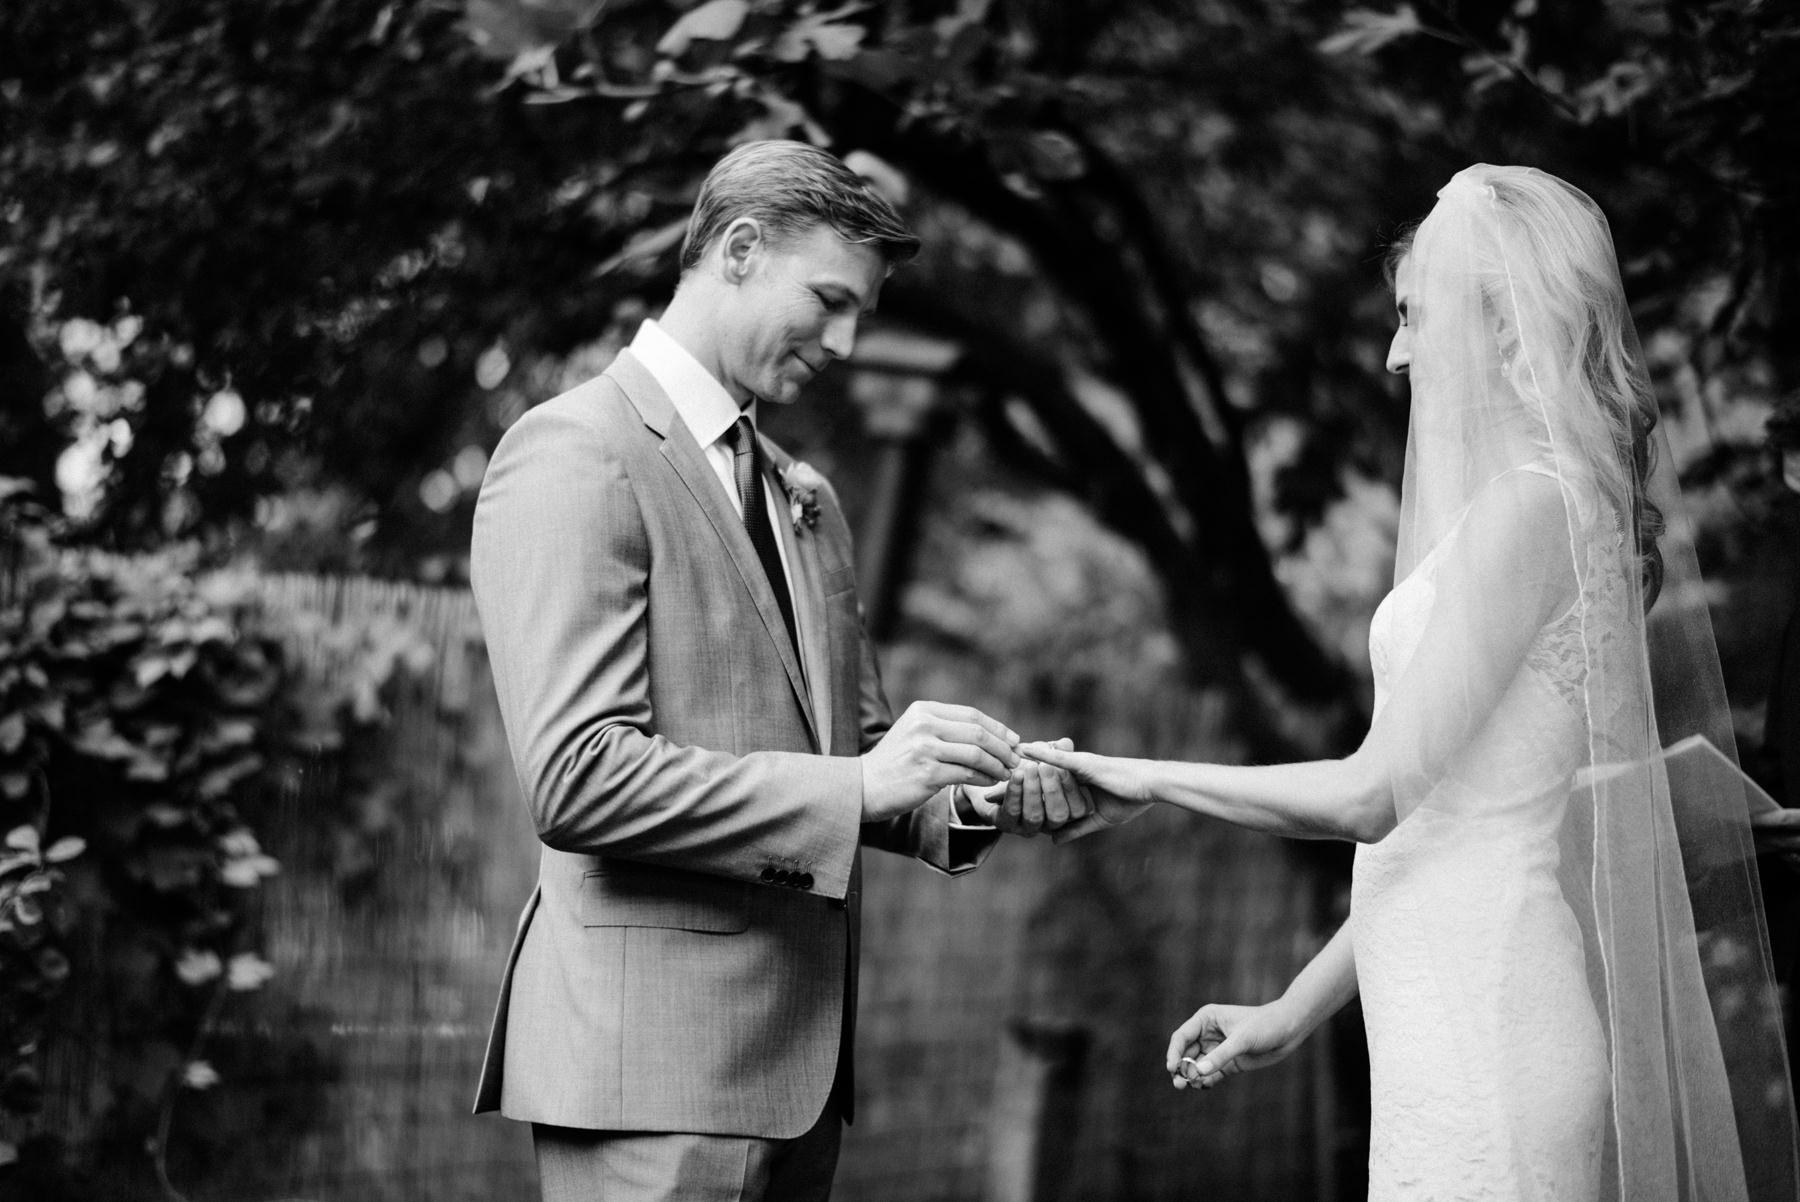 214-outdoor-wedding-ceremony-at-the-corson-building.jpg